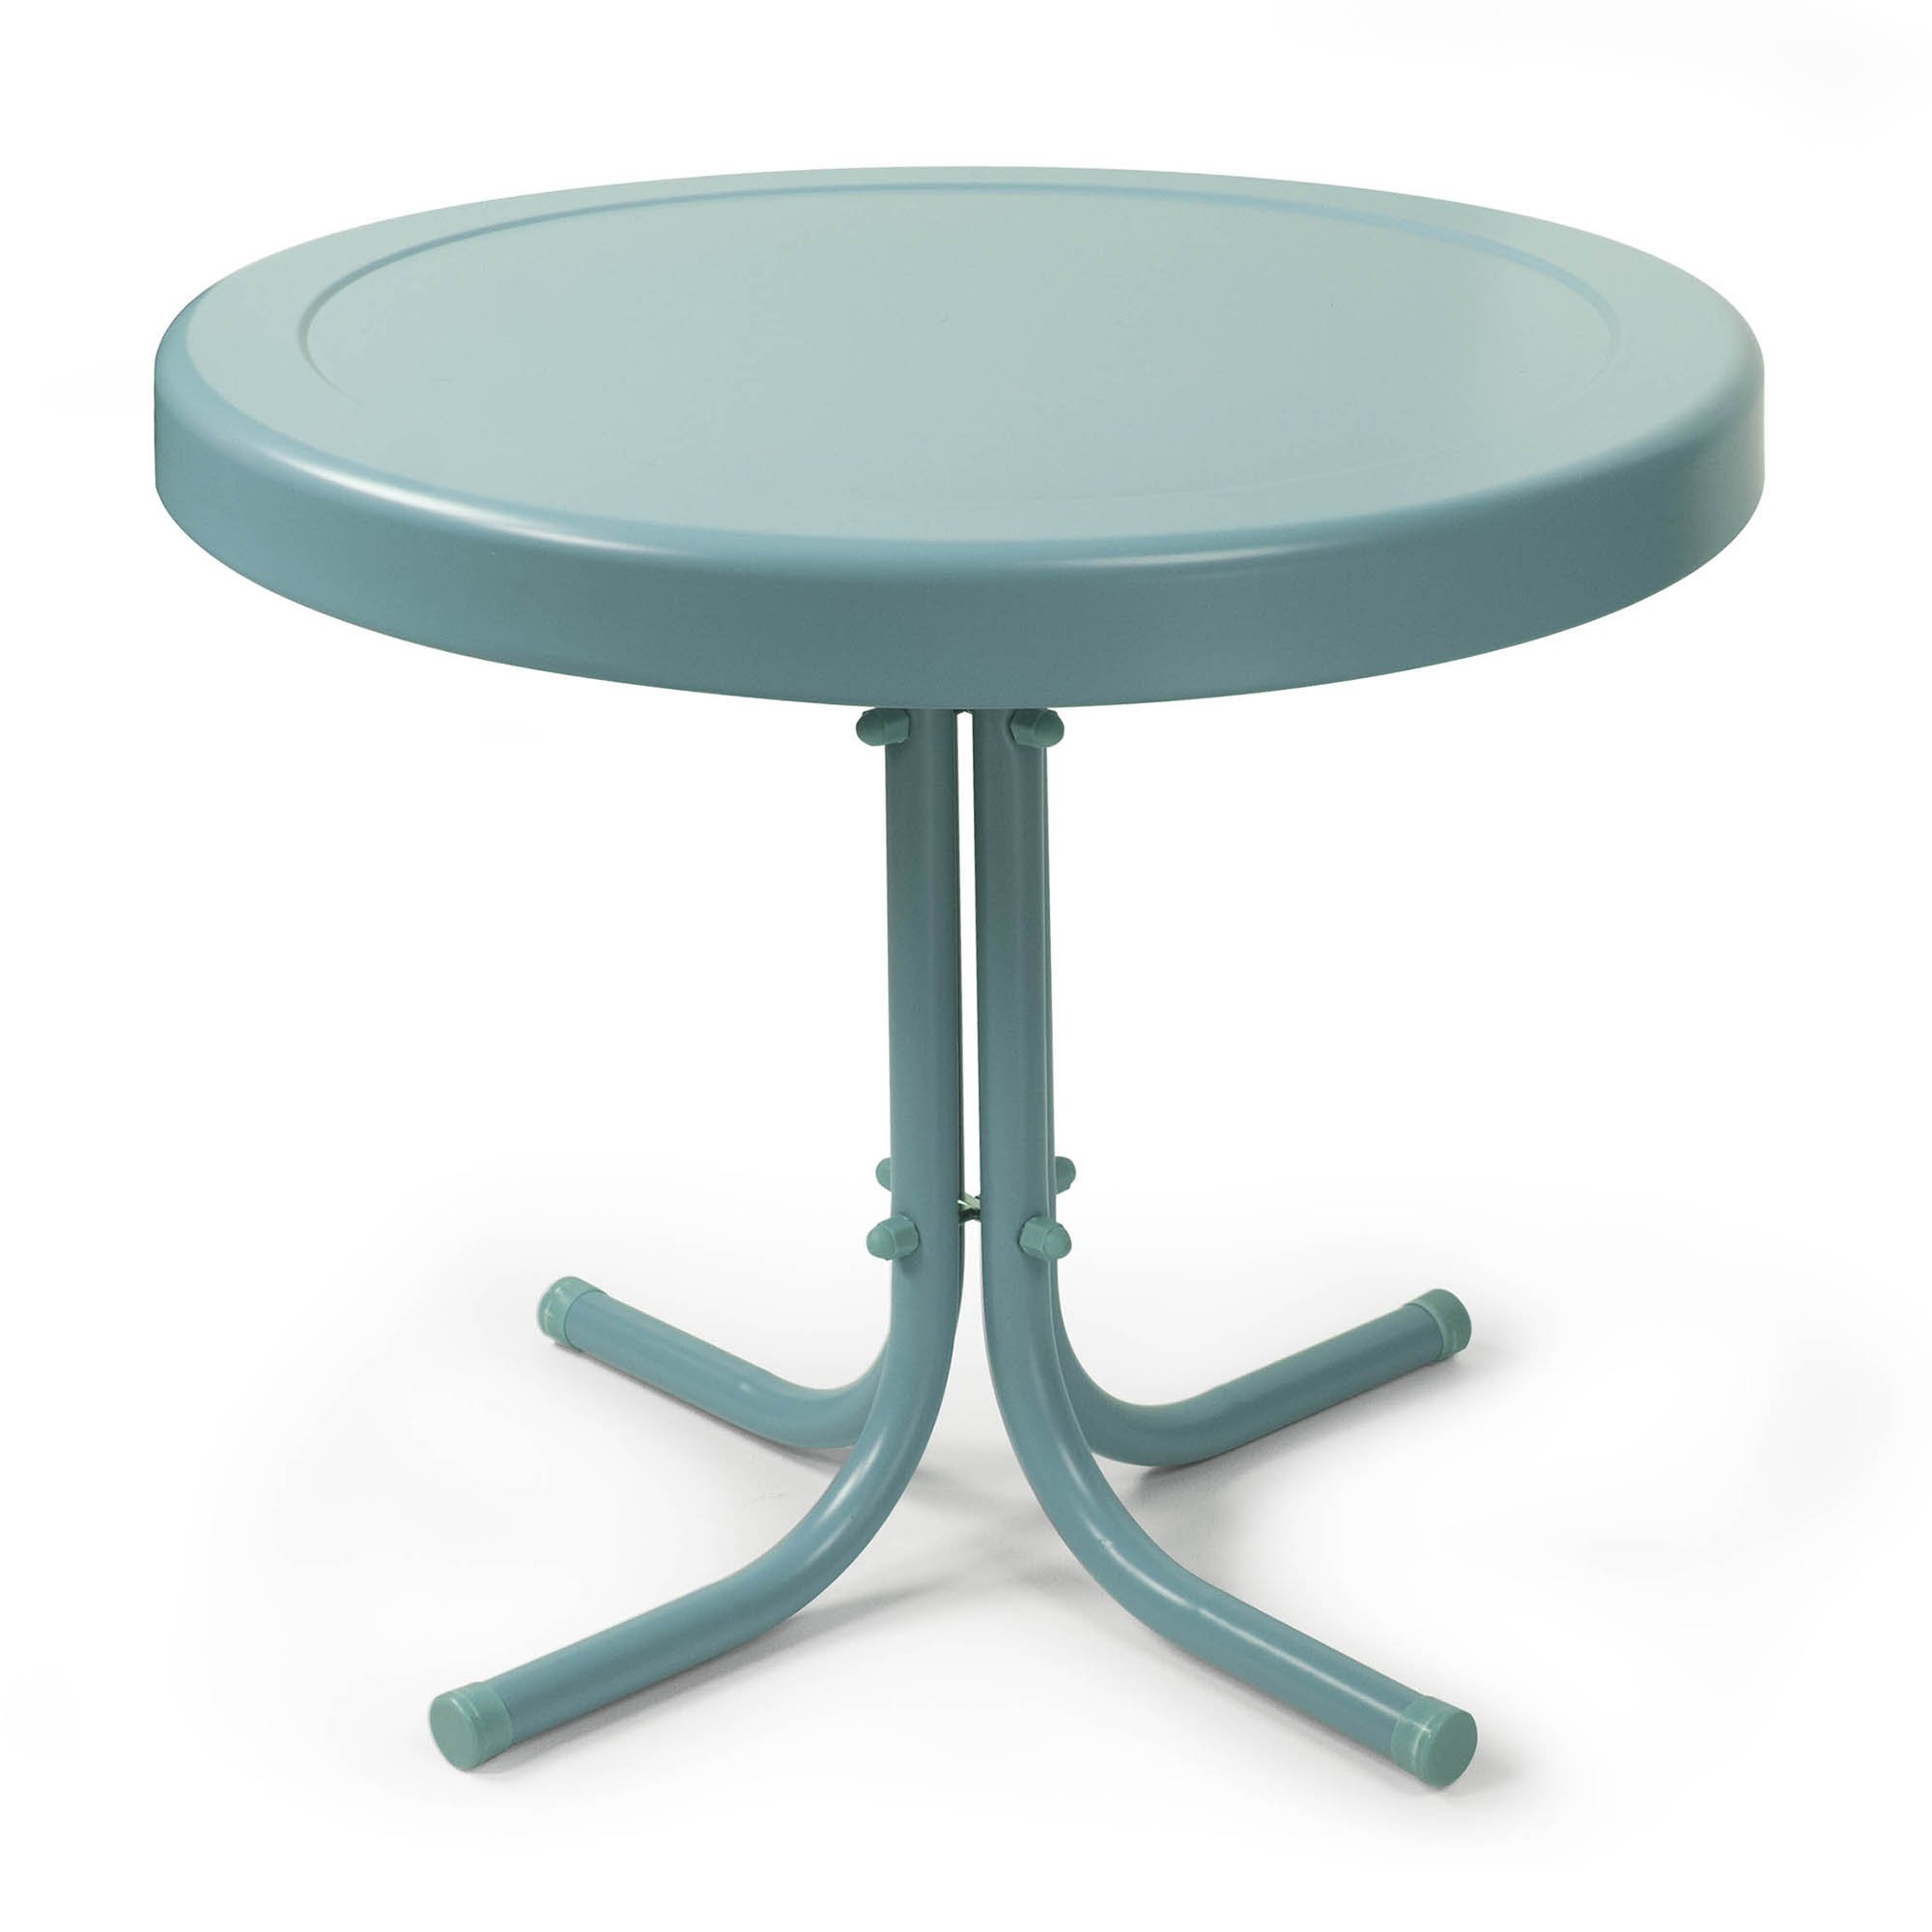 Crosley Furniture Retro Metal Side Table - Walmart.com